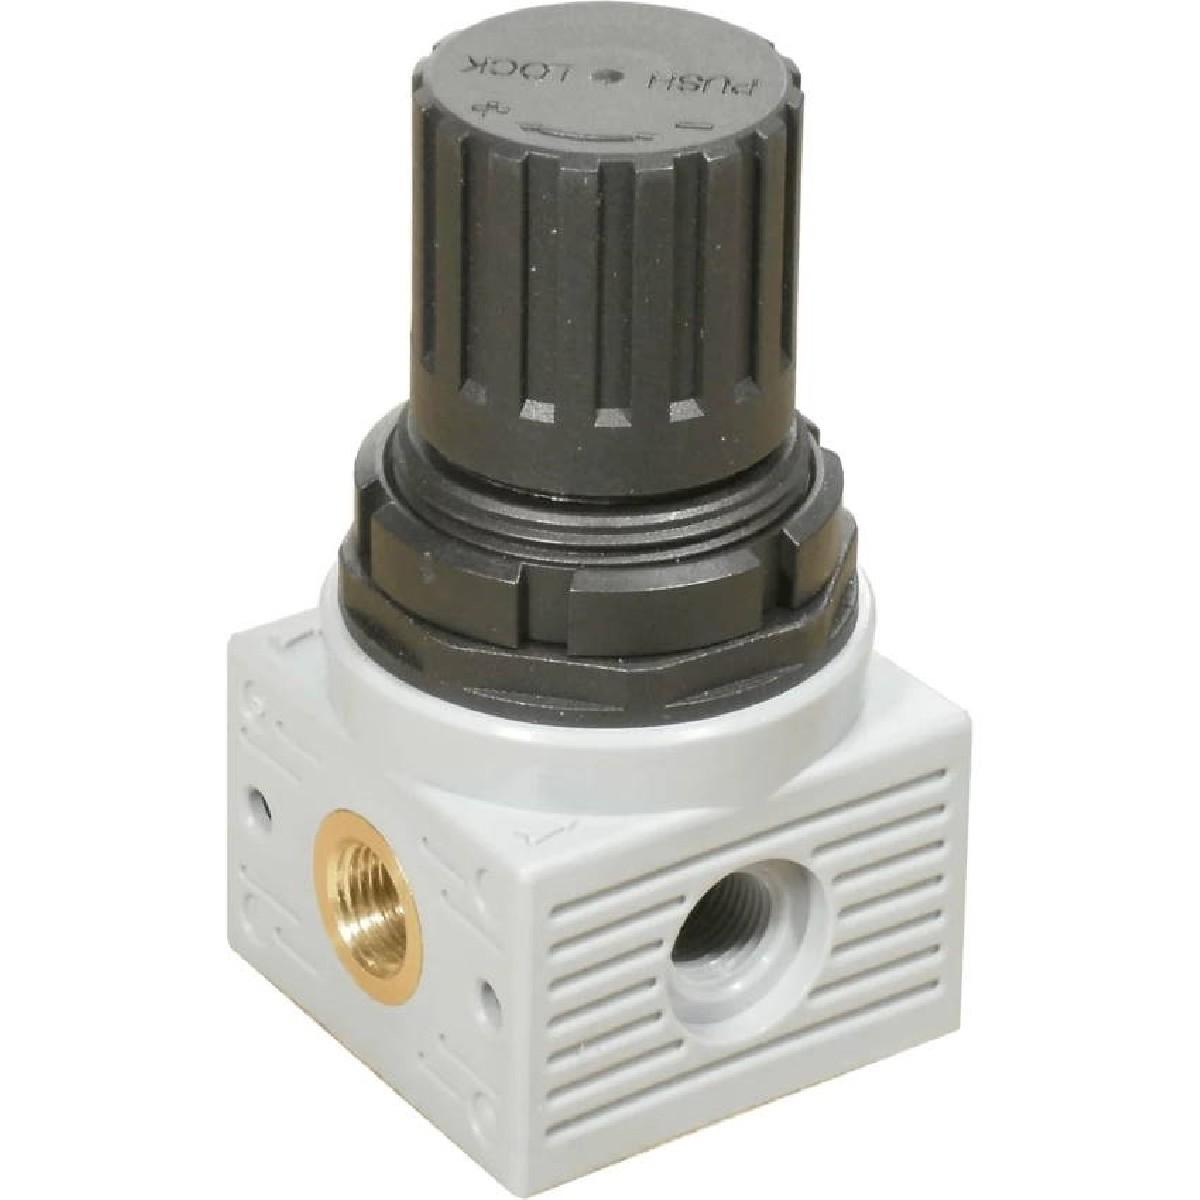 Pressure Regulator in compact design for water applications